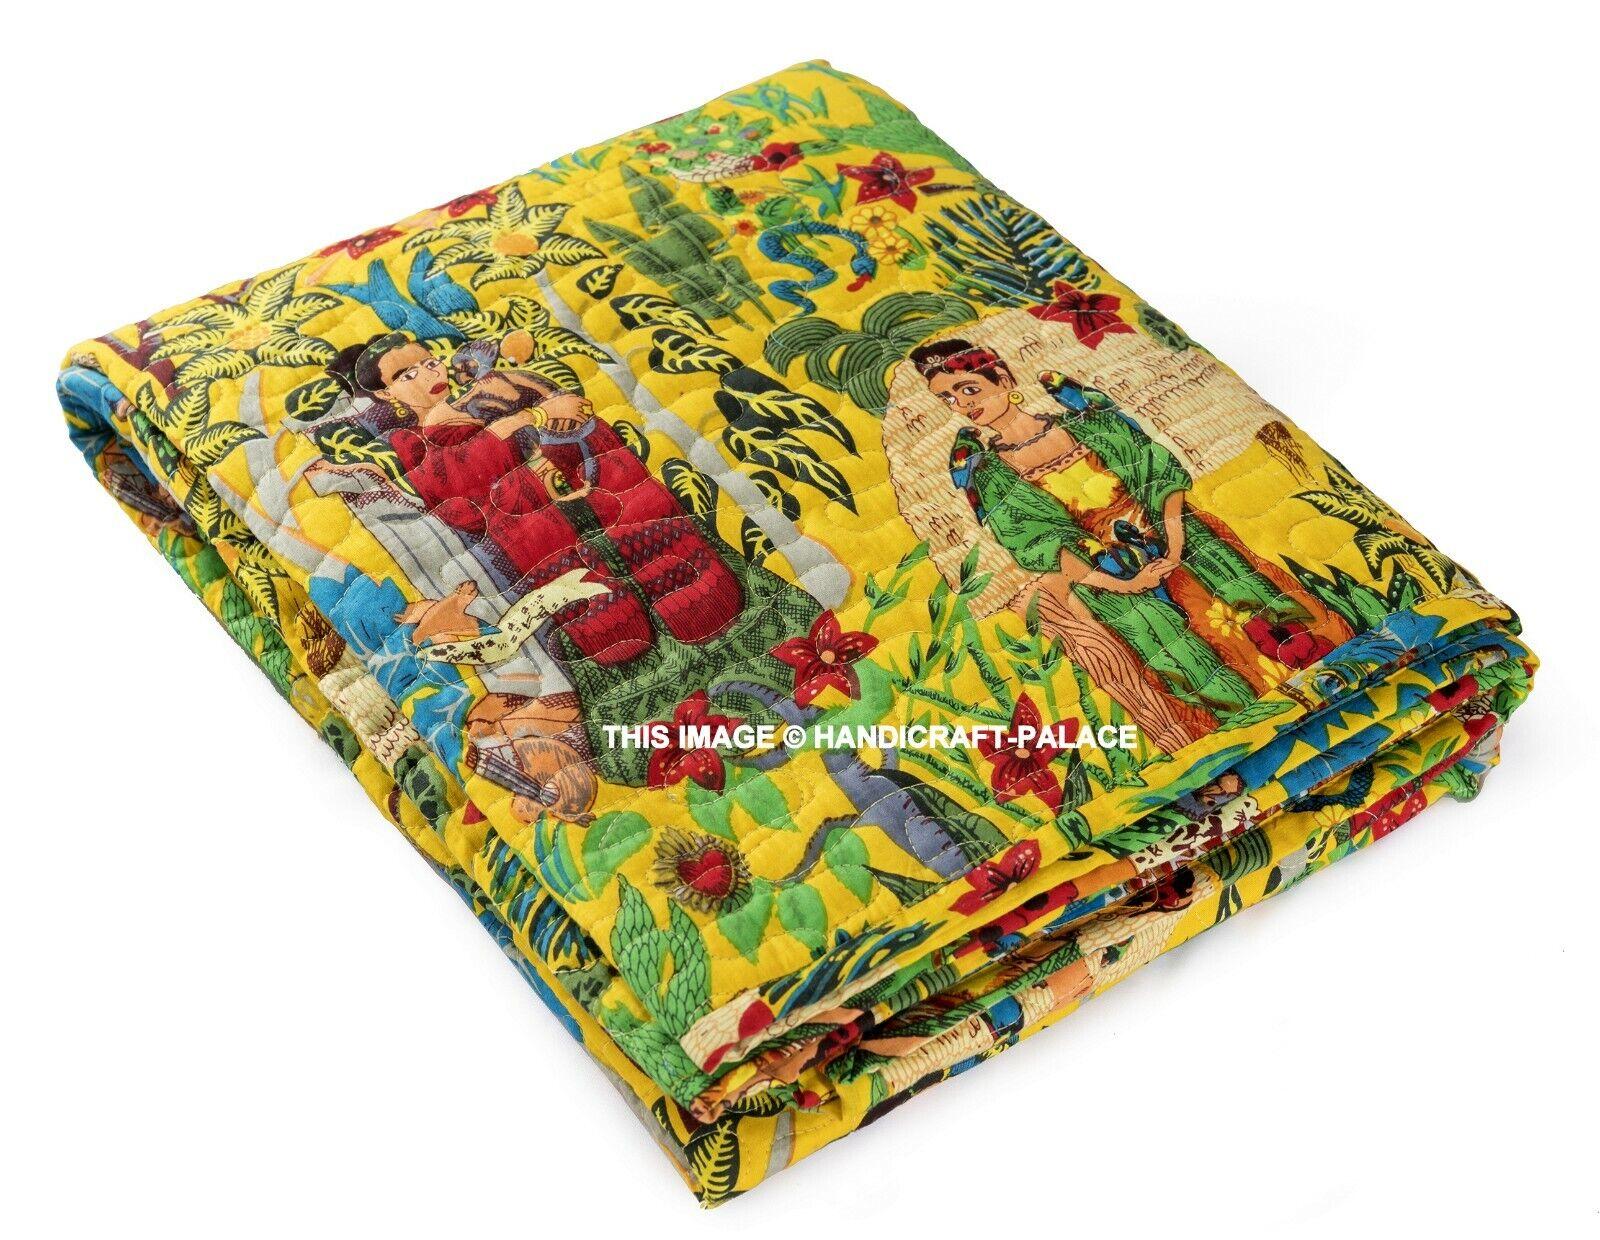 Vintage Frida Kahlo Kantha Tagesdecke Indisch Handmade Wende Steppdecke 178cm